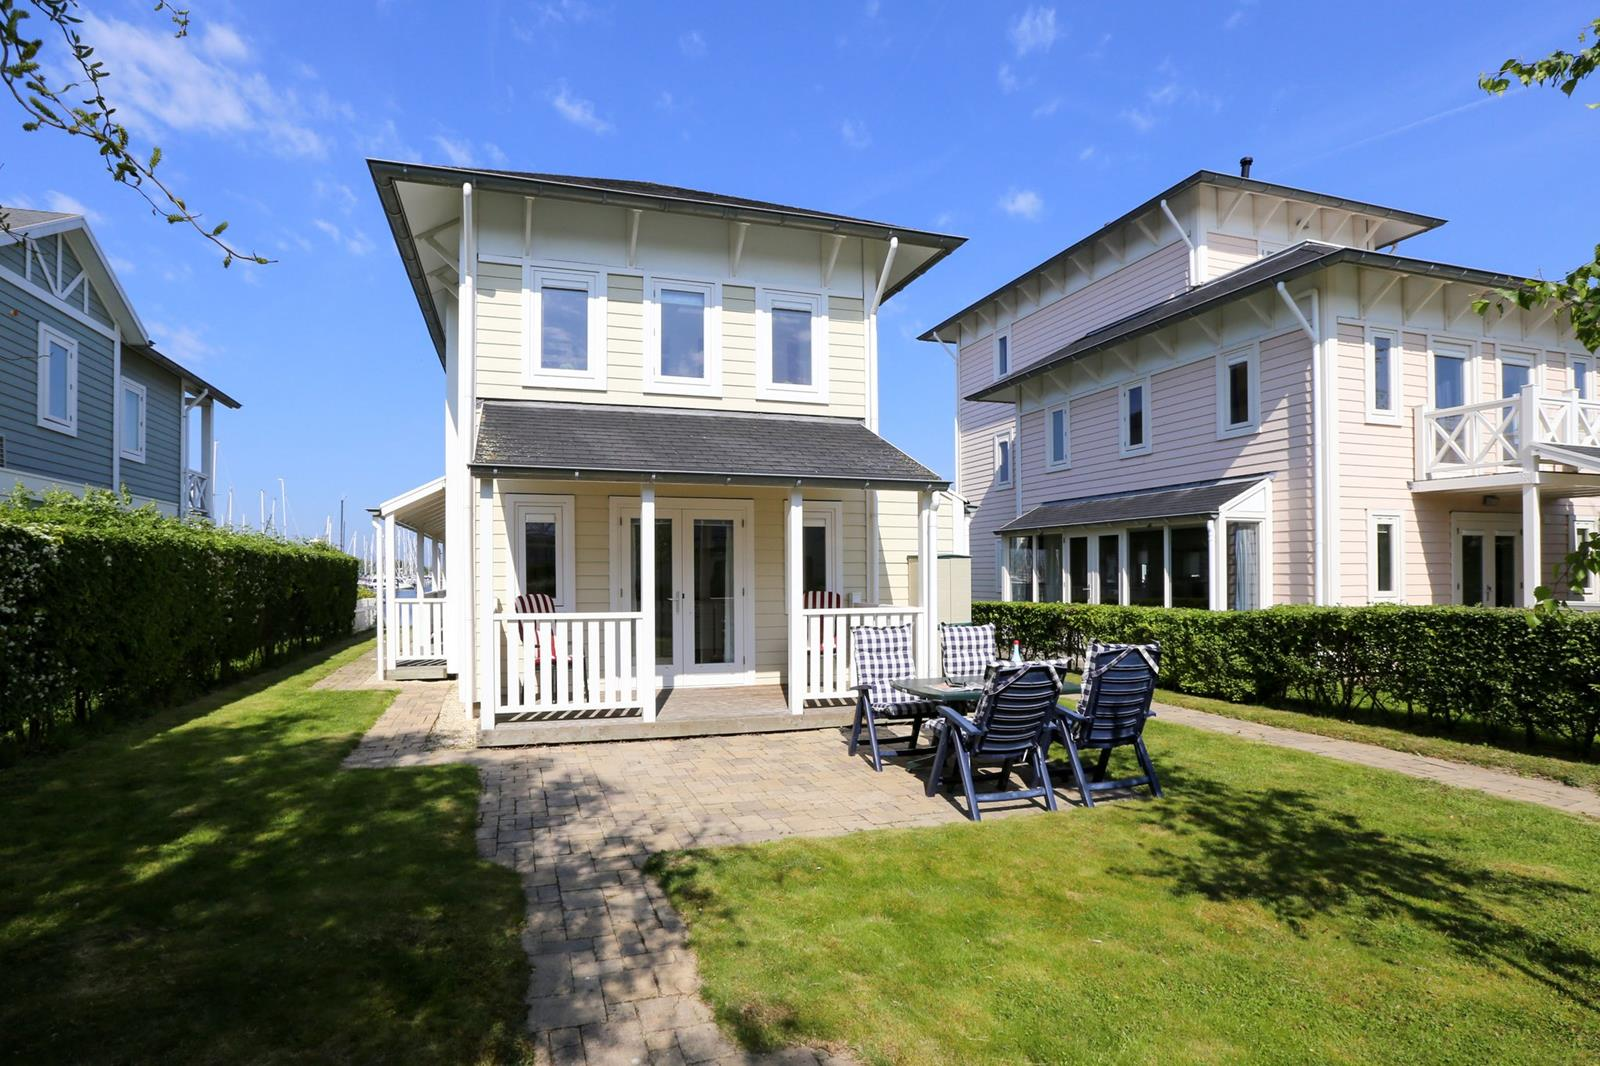 Vakantiehuis te koop aan water in Zuid-Holland 046.jpg